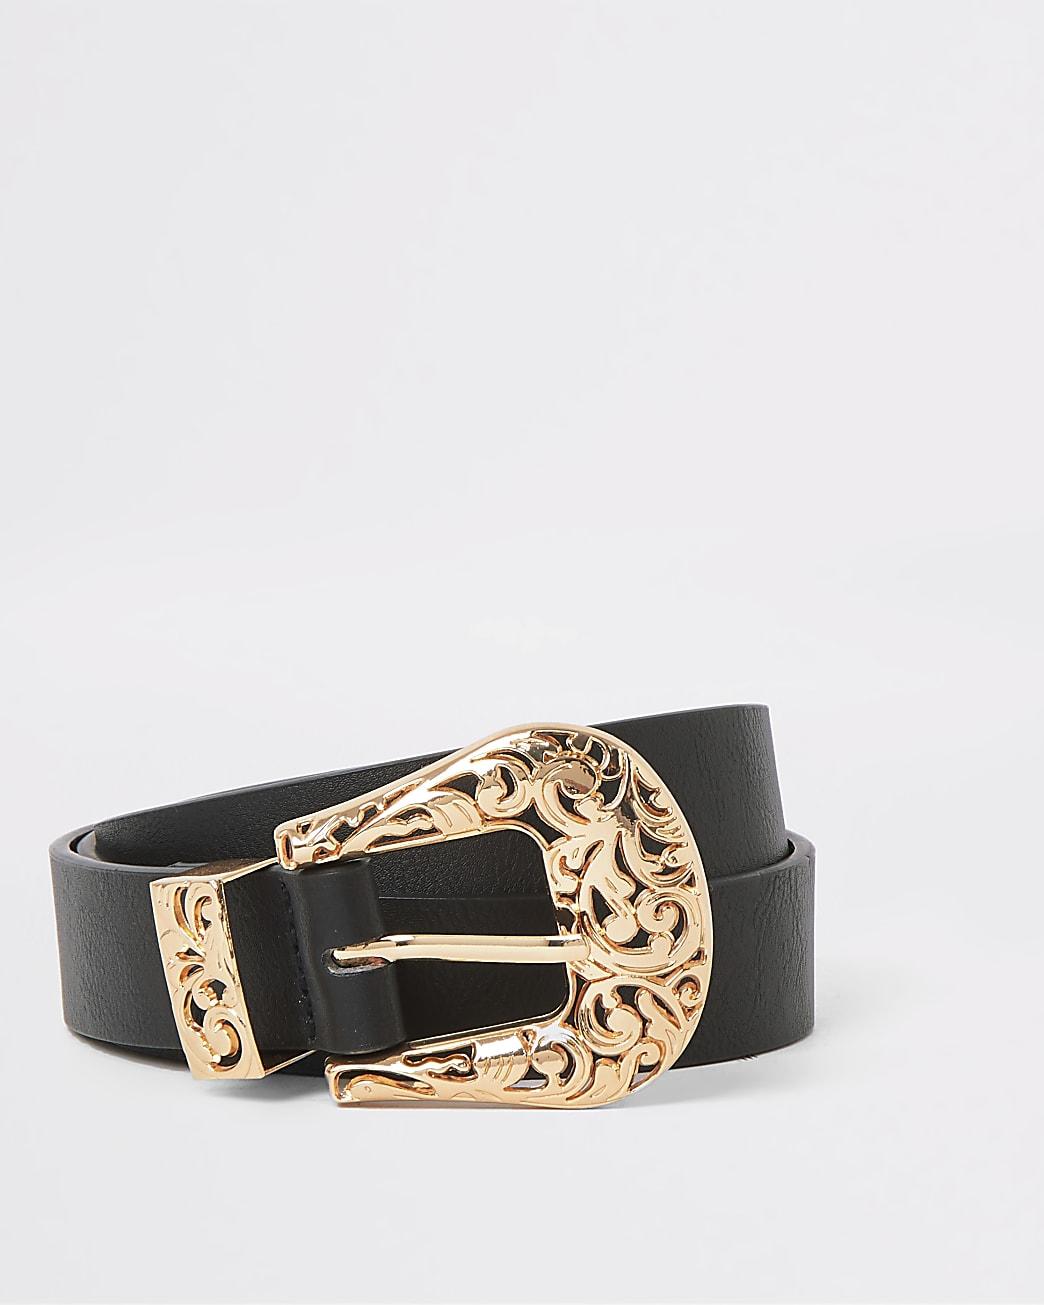 Black western inspired buckle belt